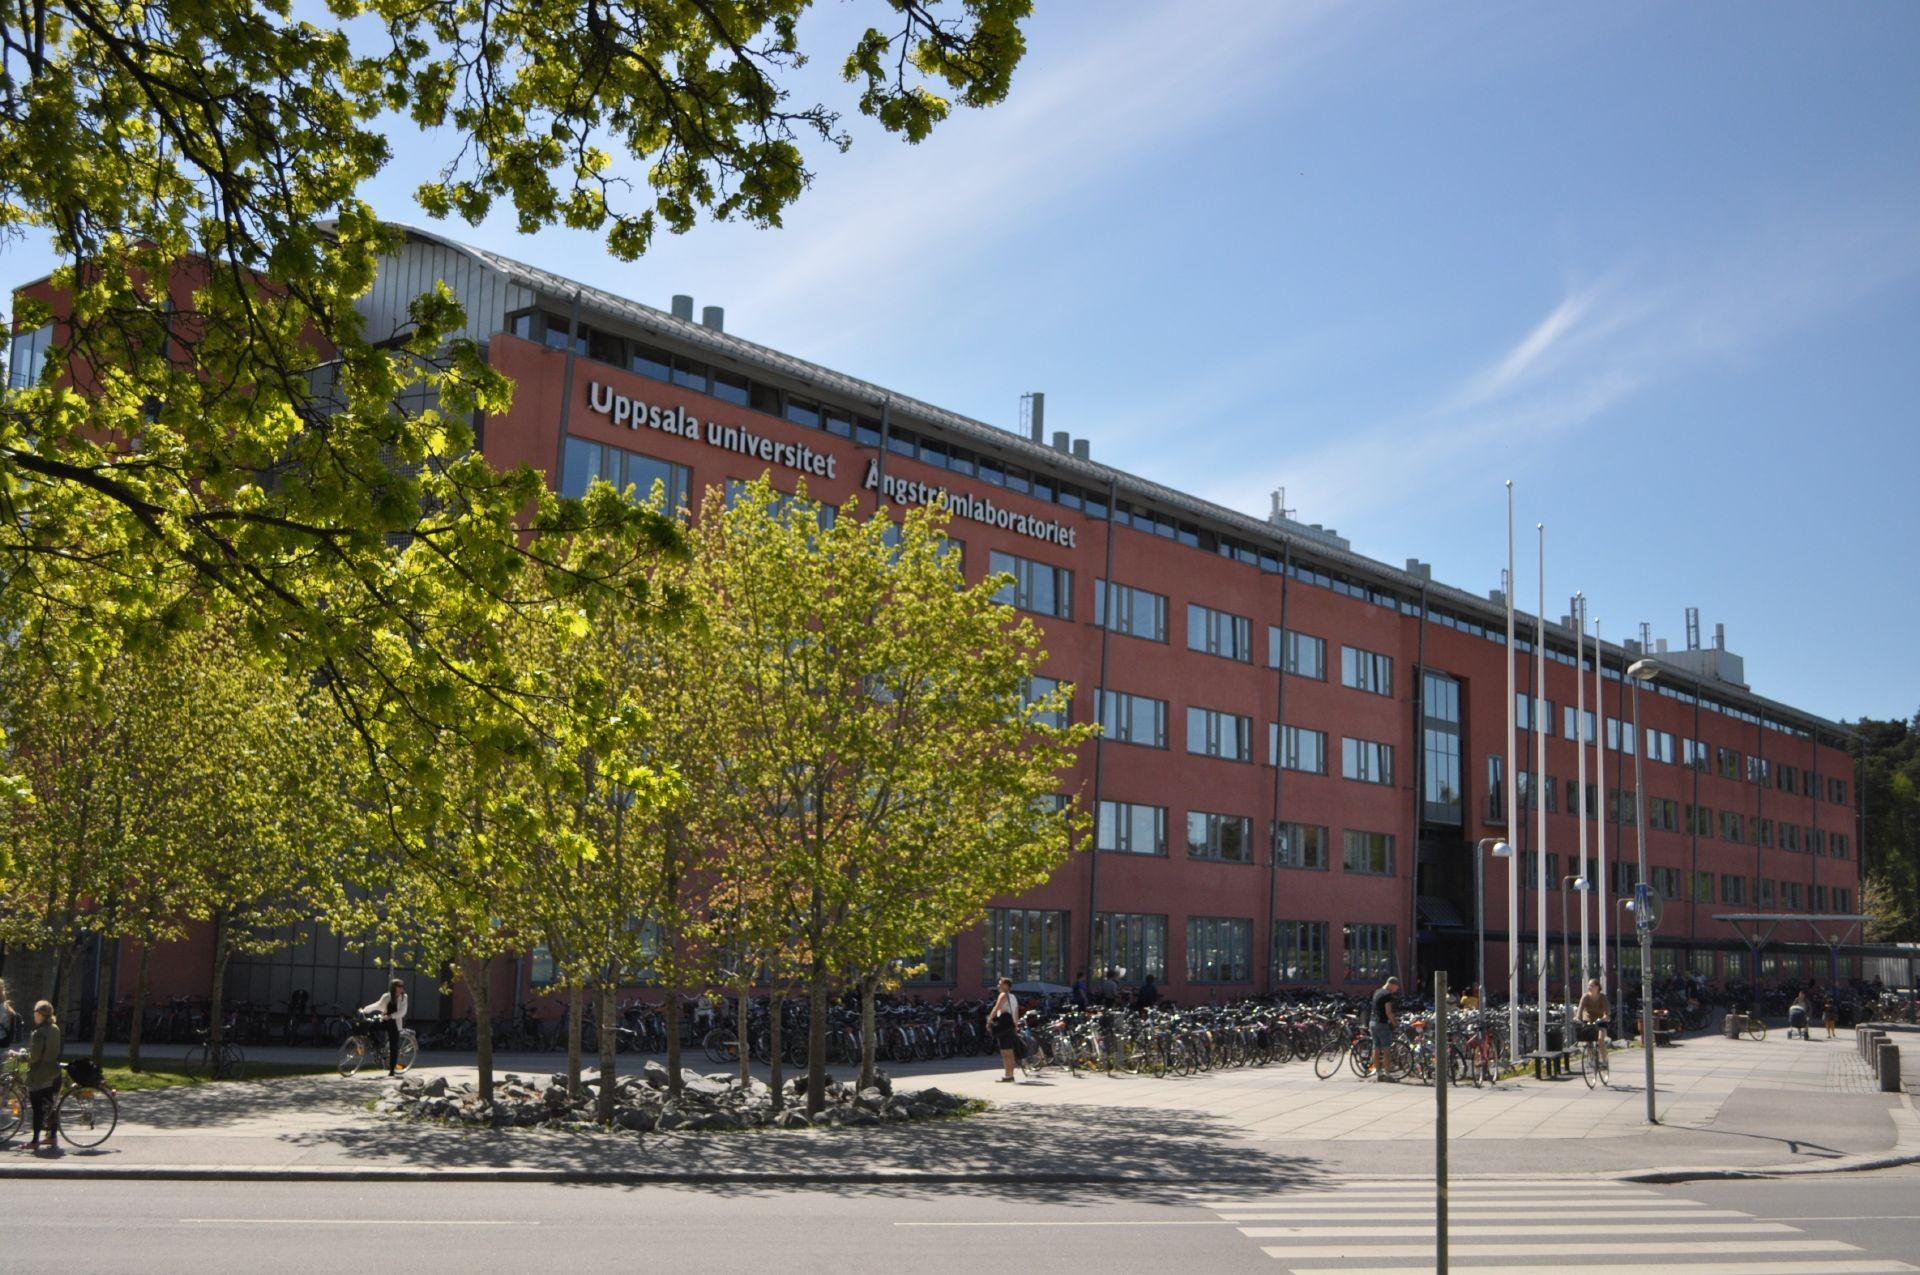 Uppsala University, Department of Chemistry - Ångström